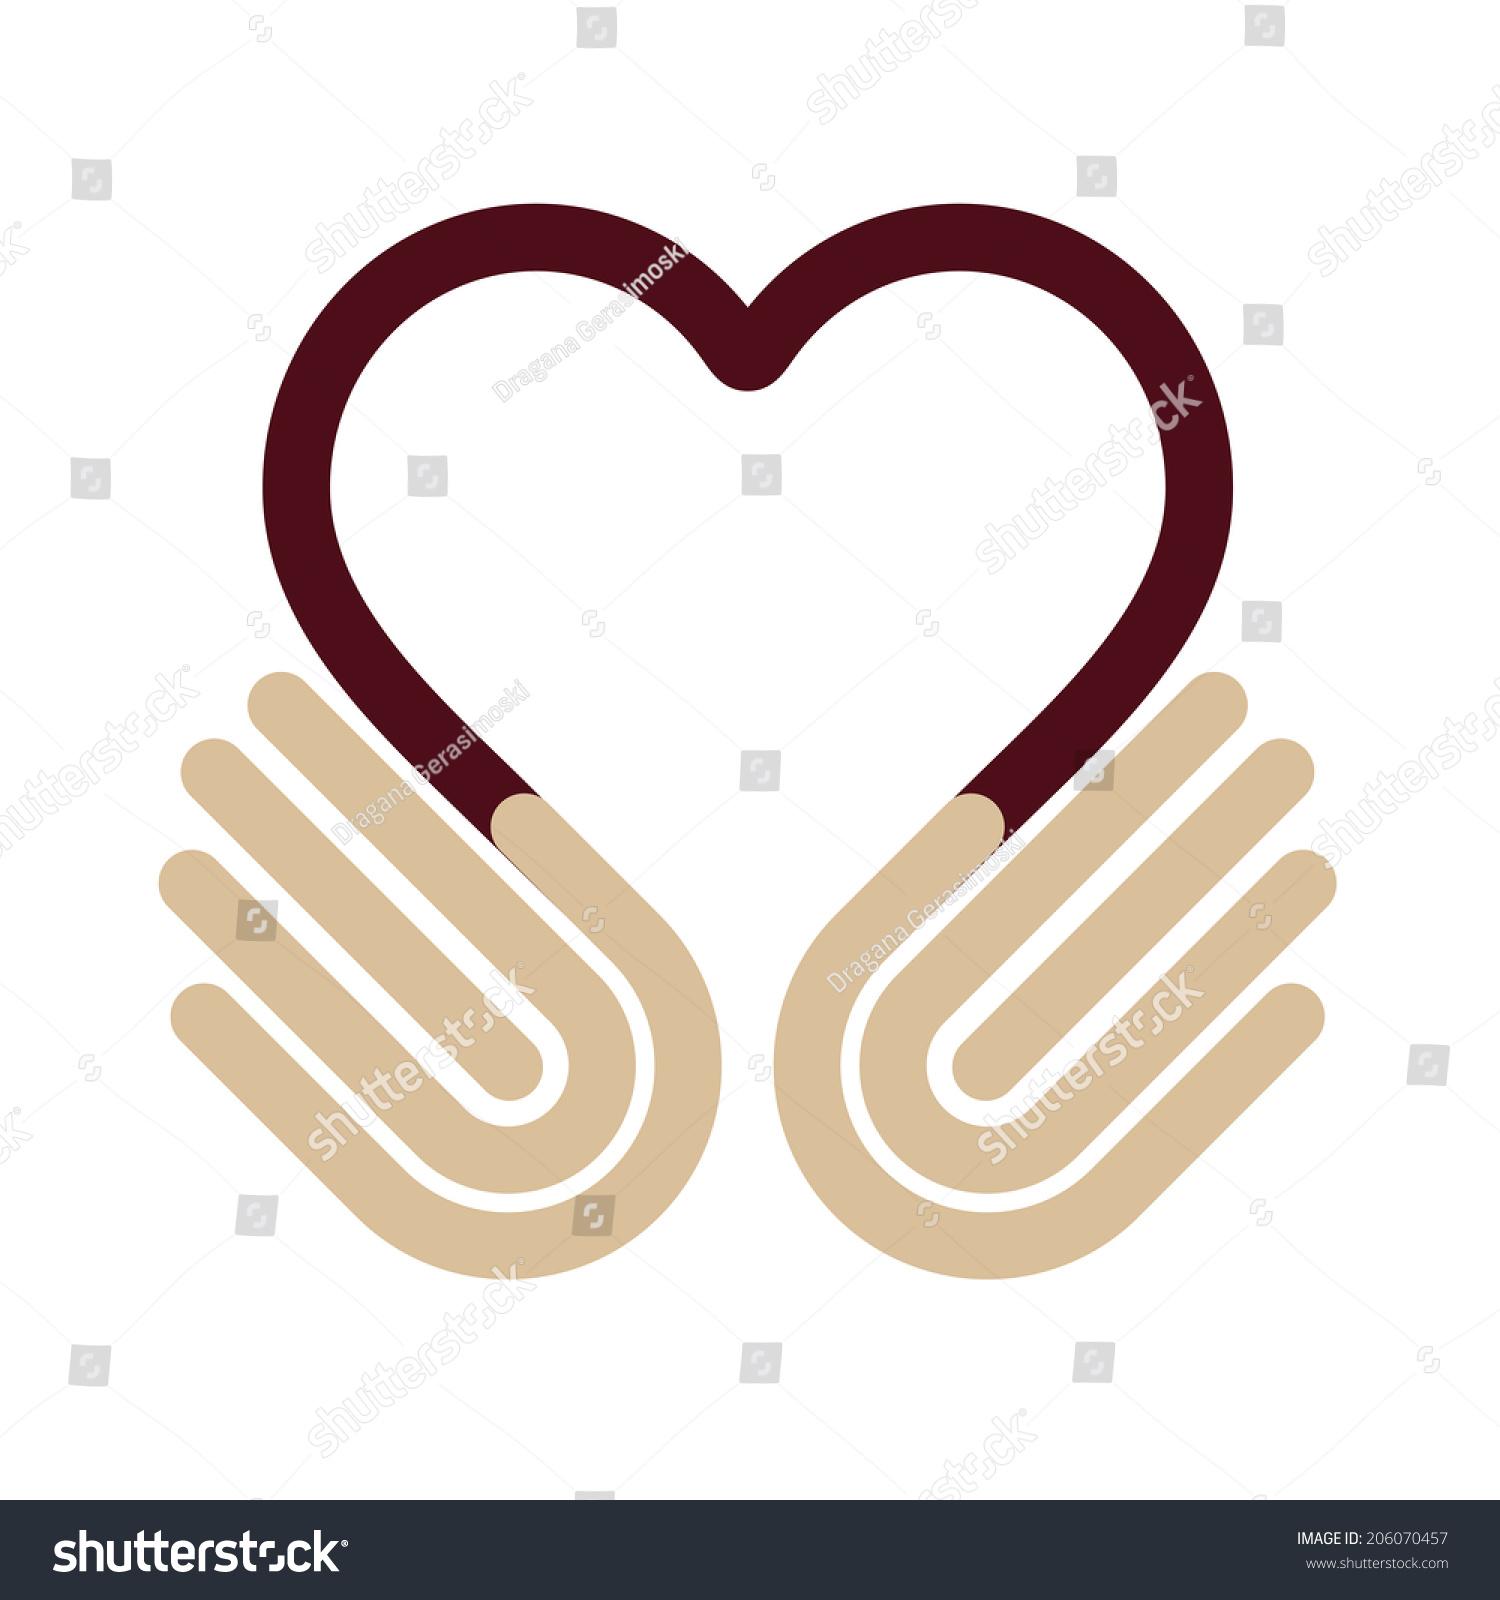 Heart Symbol Hands Help Concept Give Stock Illustration 206070457